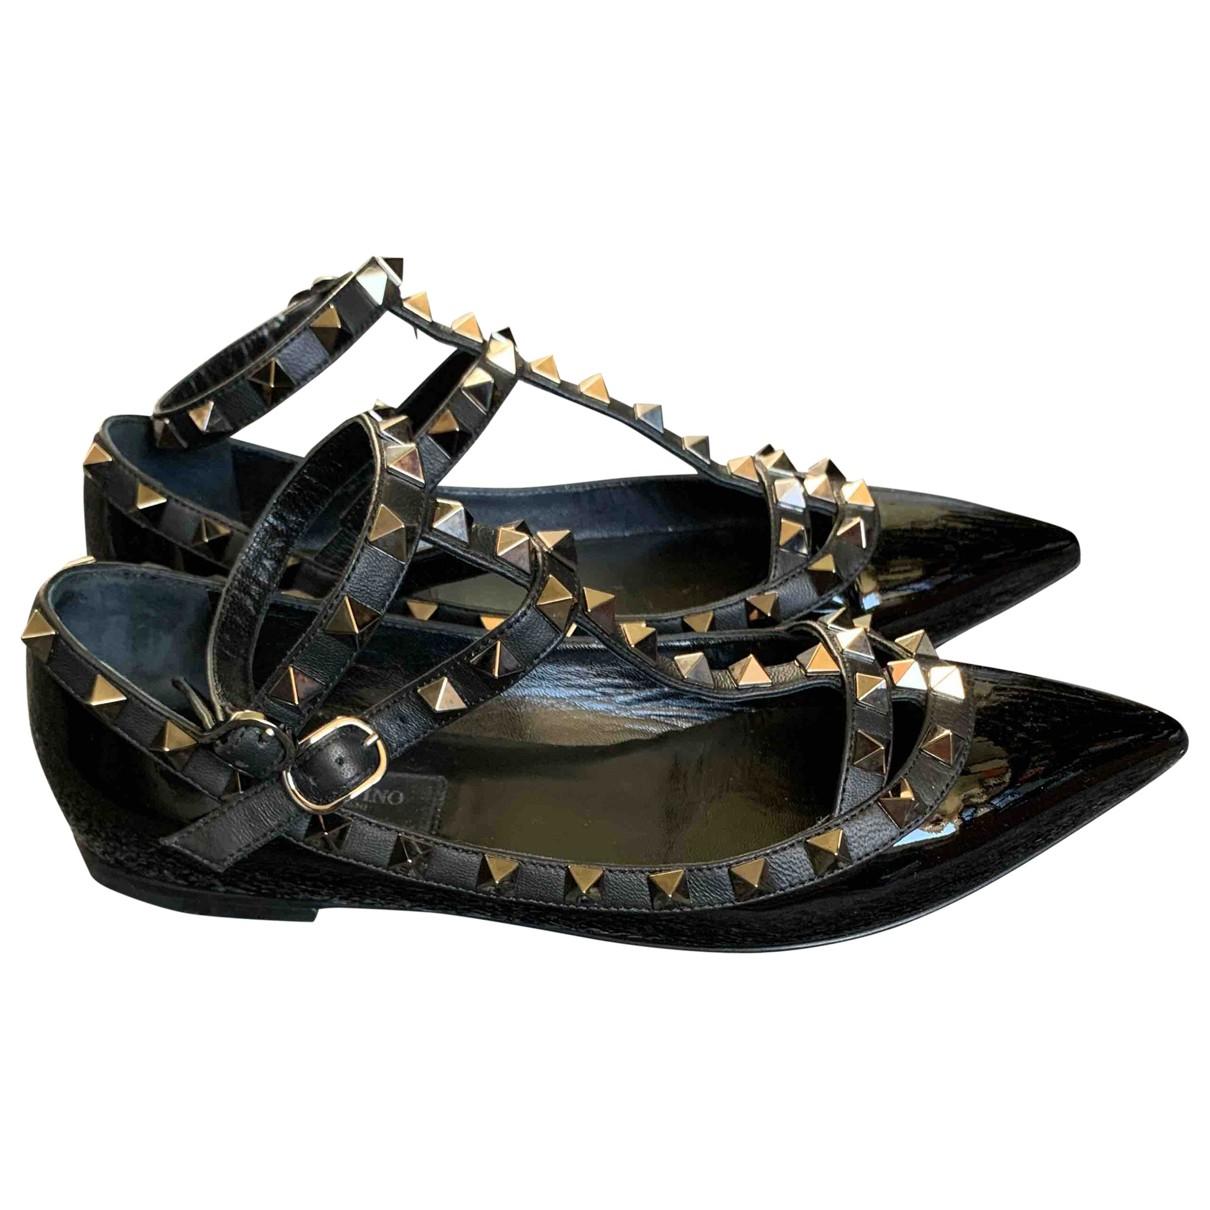 Valentino Garavani Rockstud Black Patent leather Ballet flats for Women 35.5 EU